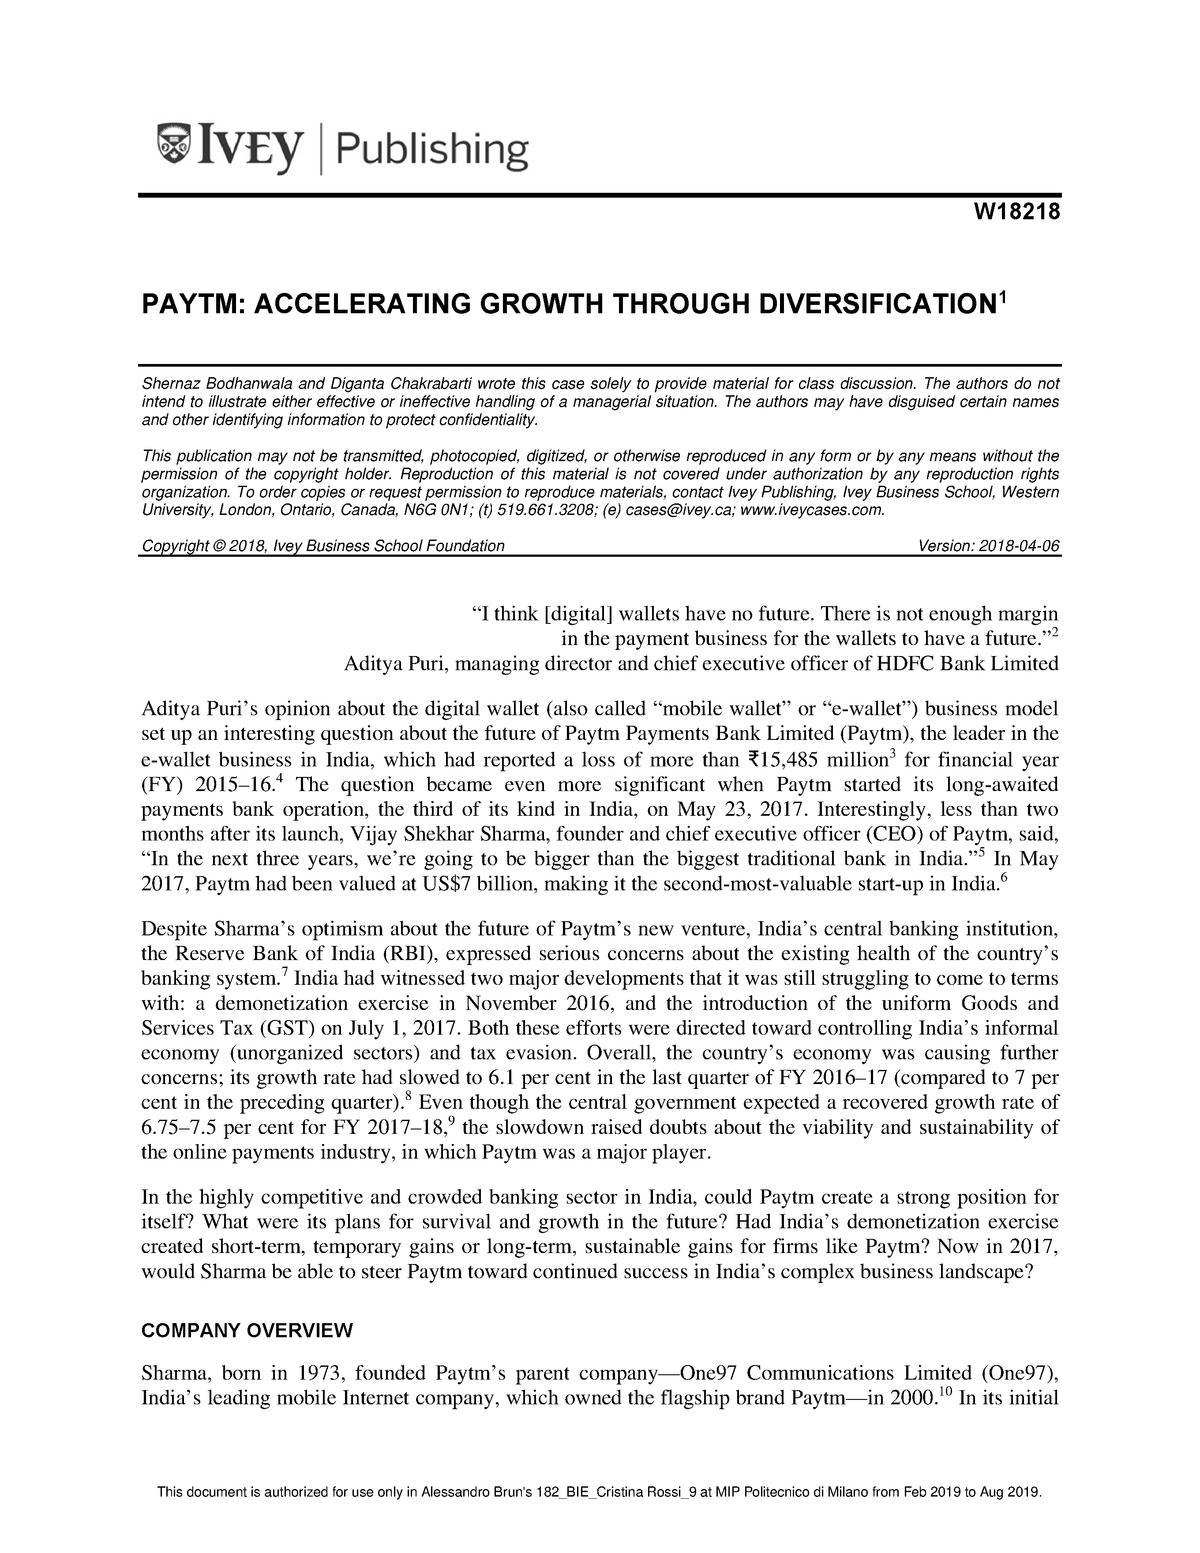 caso Paytm W18218 PDF ENG flipped classroom - 96092